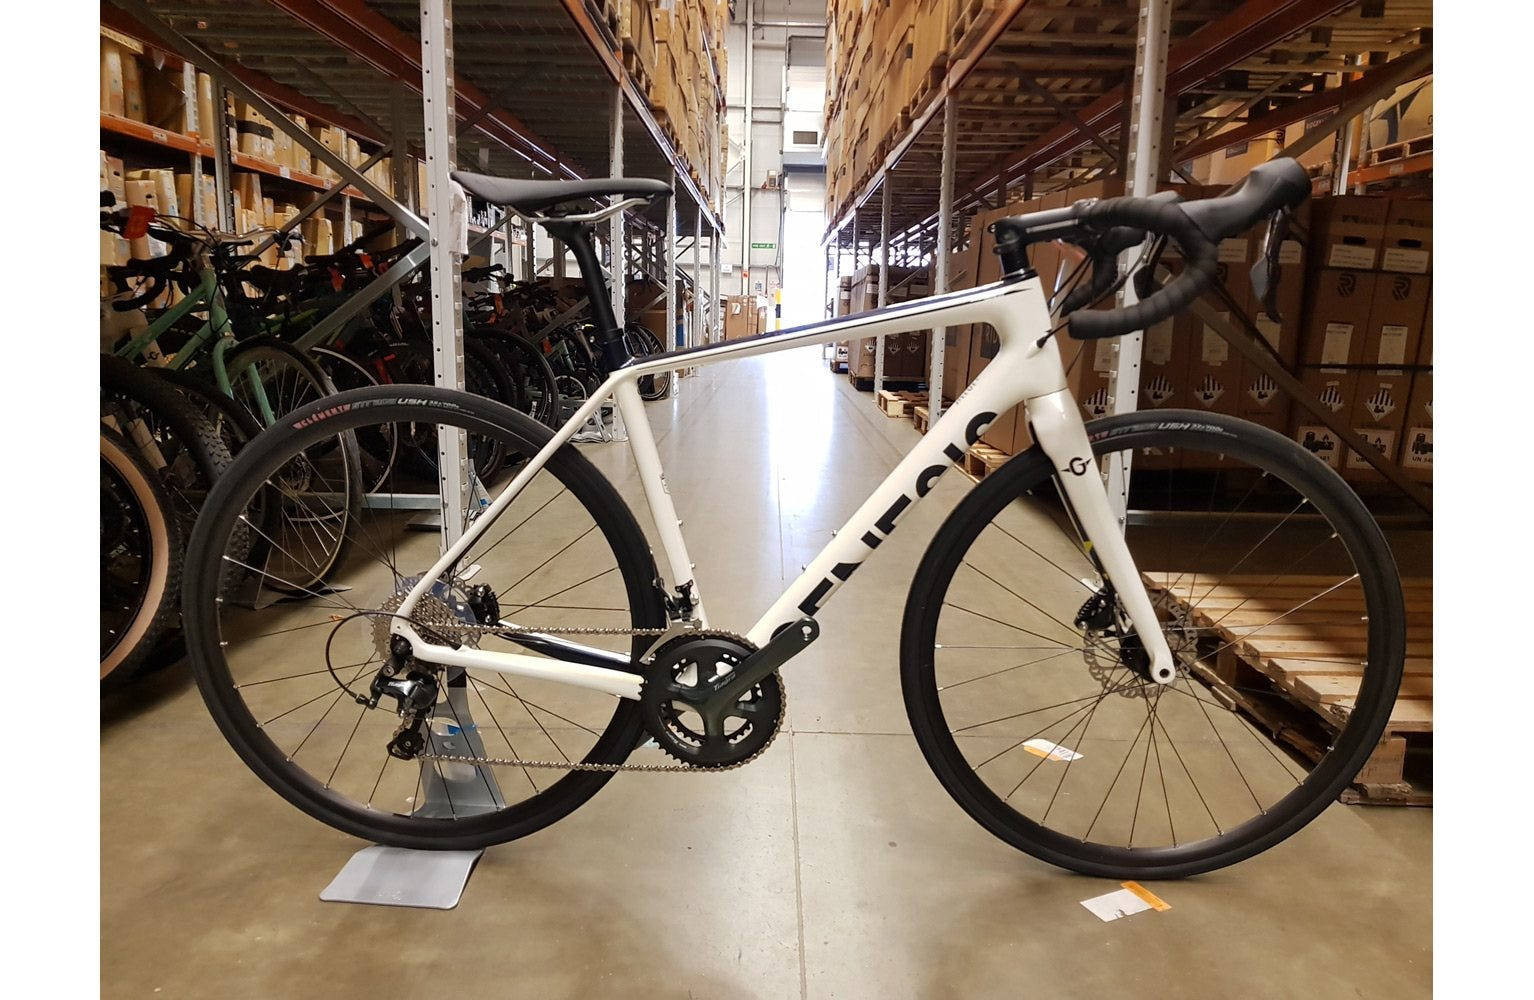 Genesis 2017 Datum 10 MD Ex Display Bike